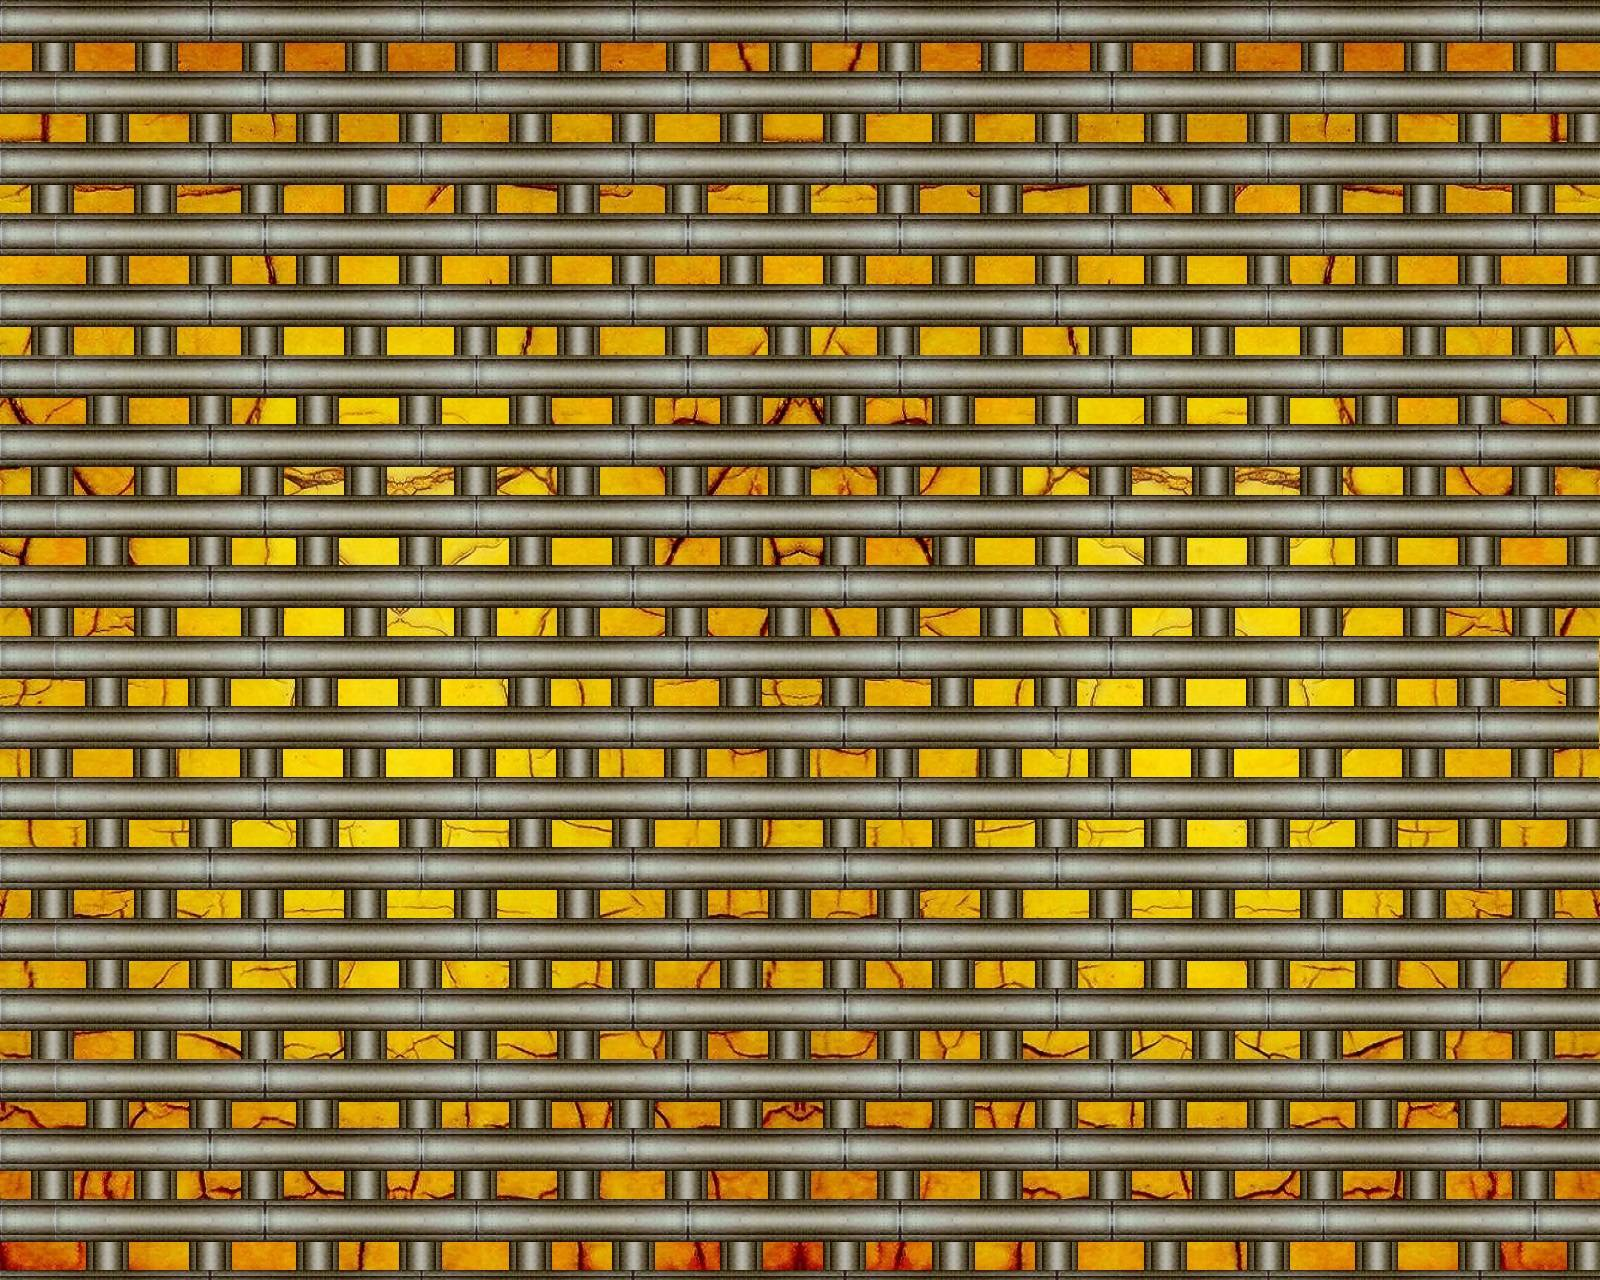 Brick Pattern 3